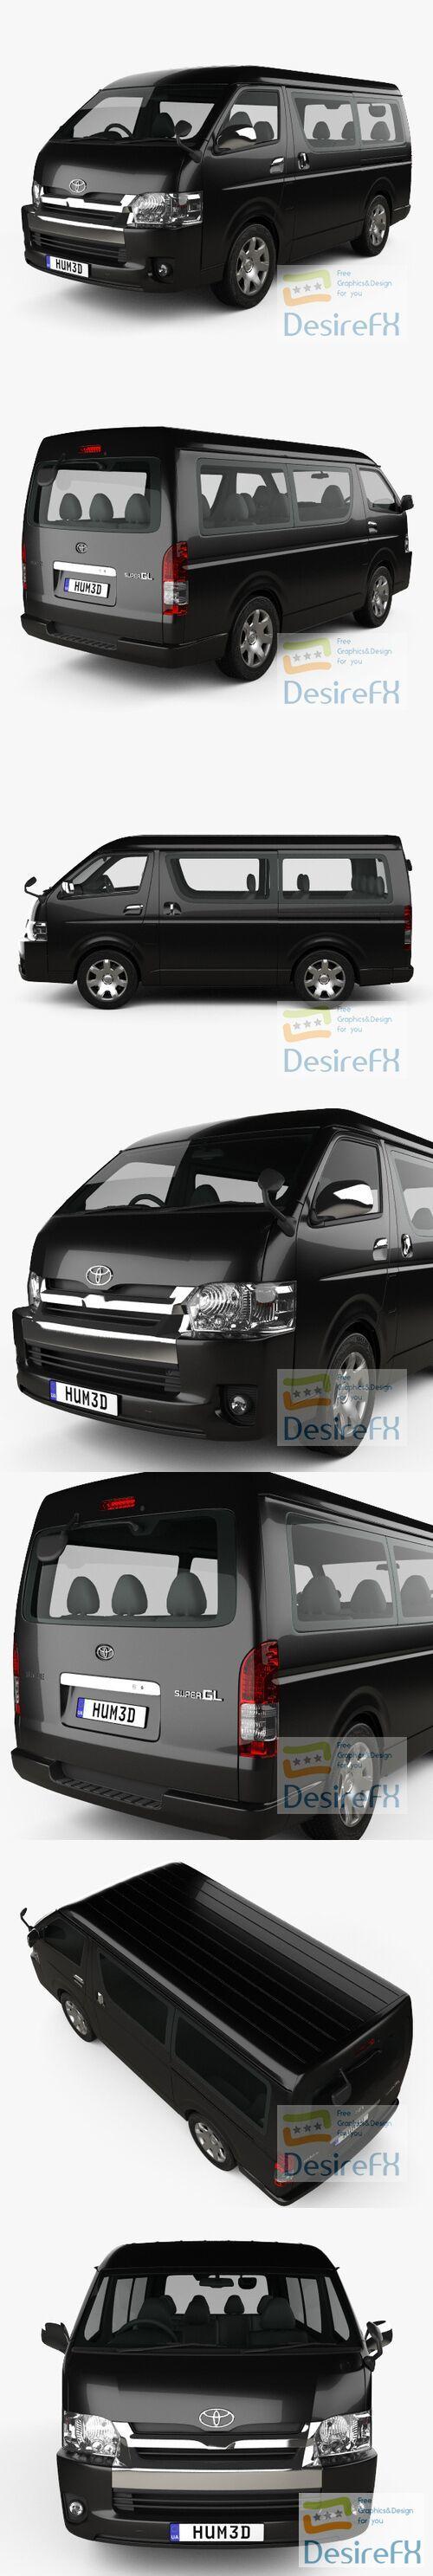 Toyota Hiace Passenger Van L1H2 GL 2013 3D Model